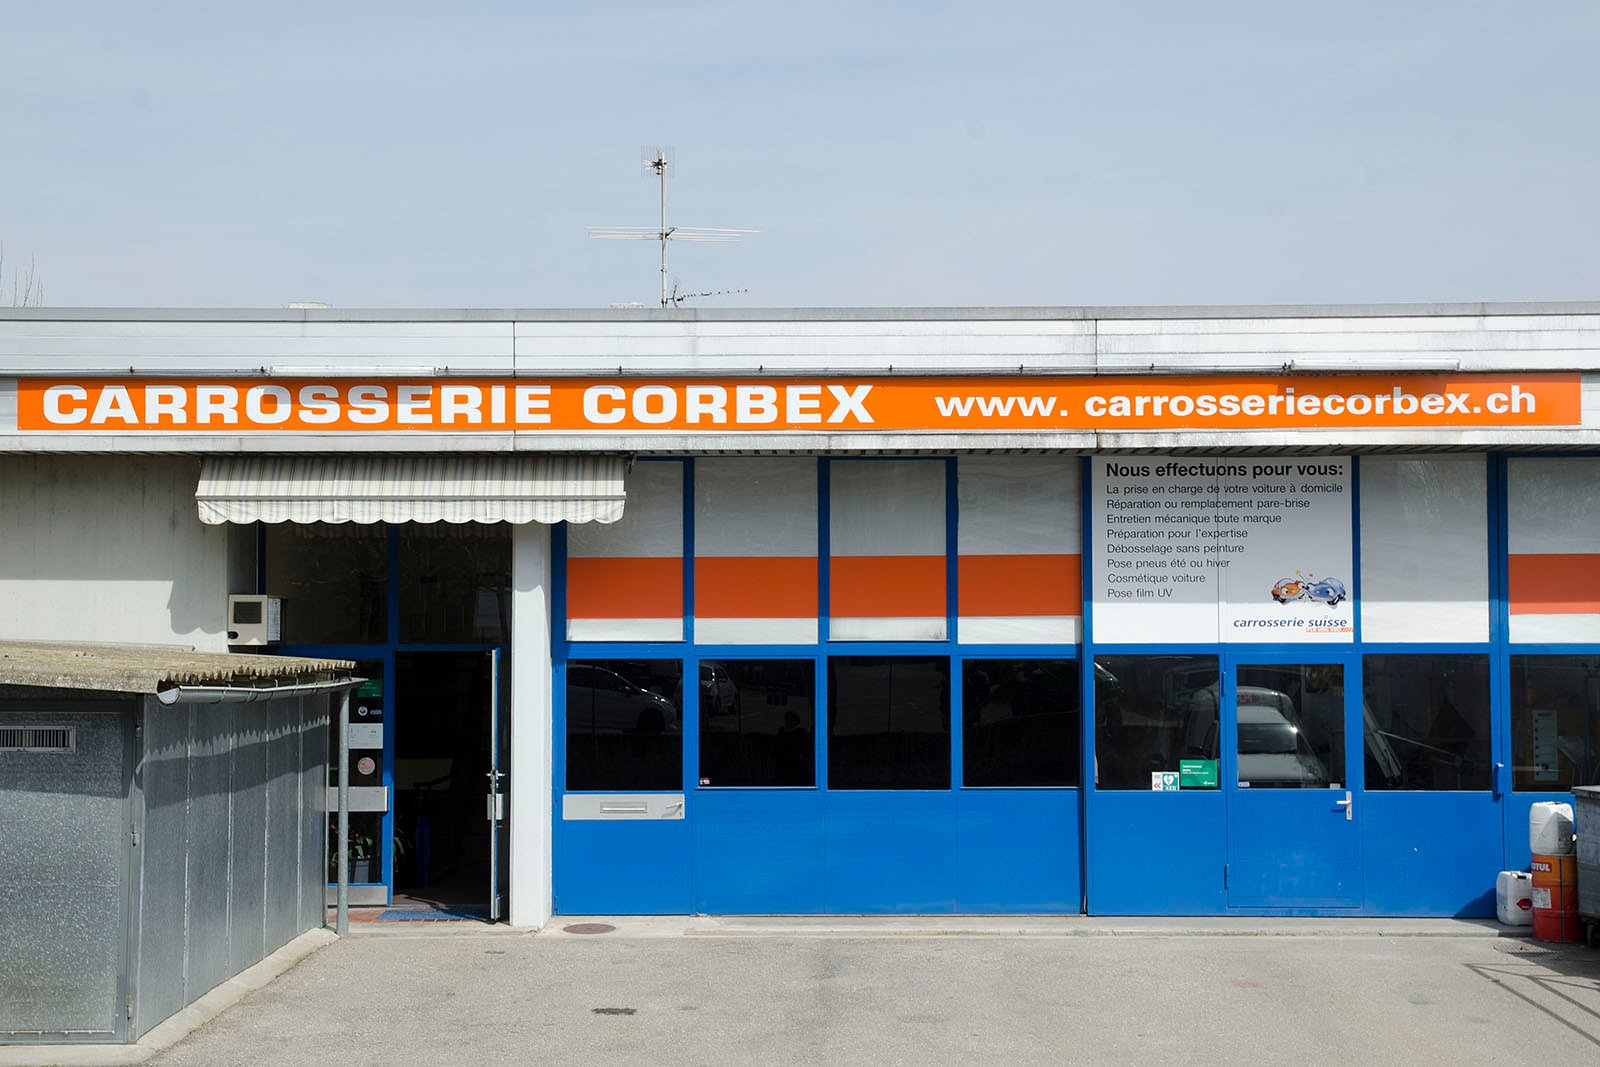 Carrosserie corbex serge et nadia le lignon adresse for W garage assurance